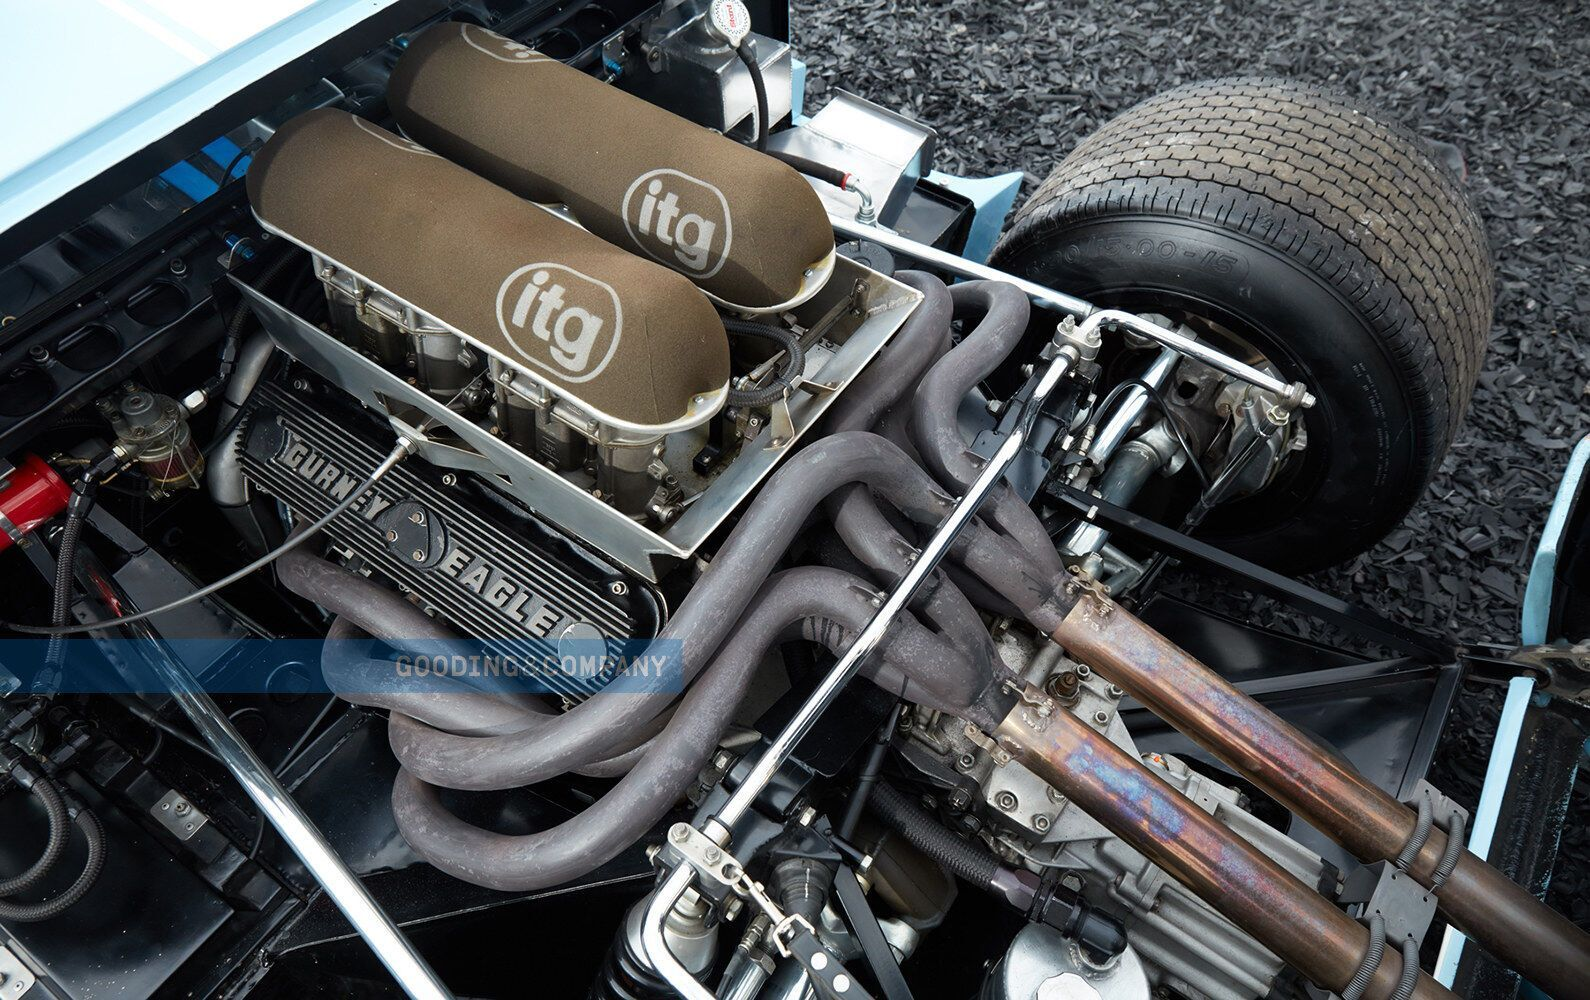 Спорткар оснащен двигателем V8